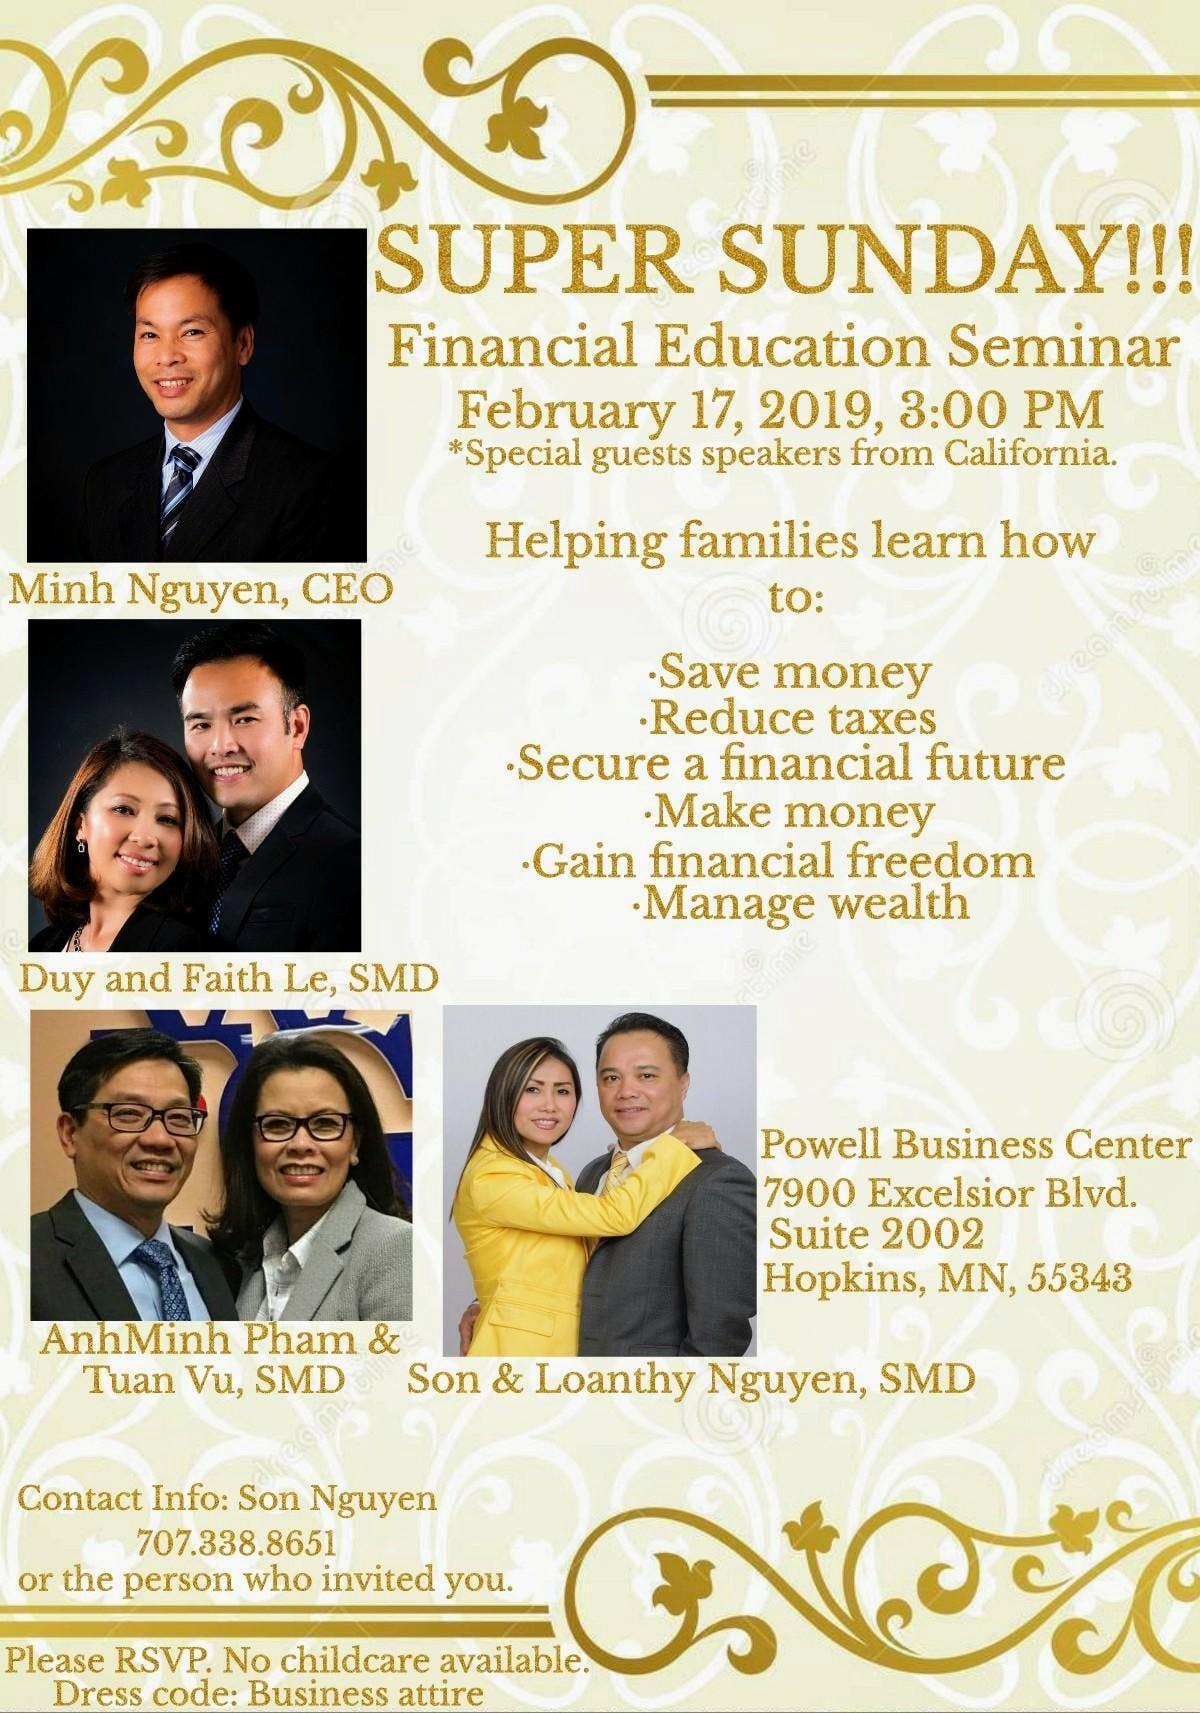 Super Sunday, Financial Education Seminar